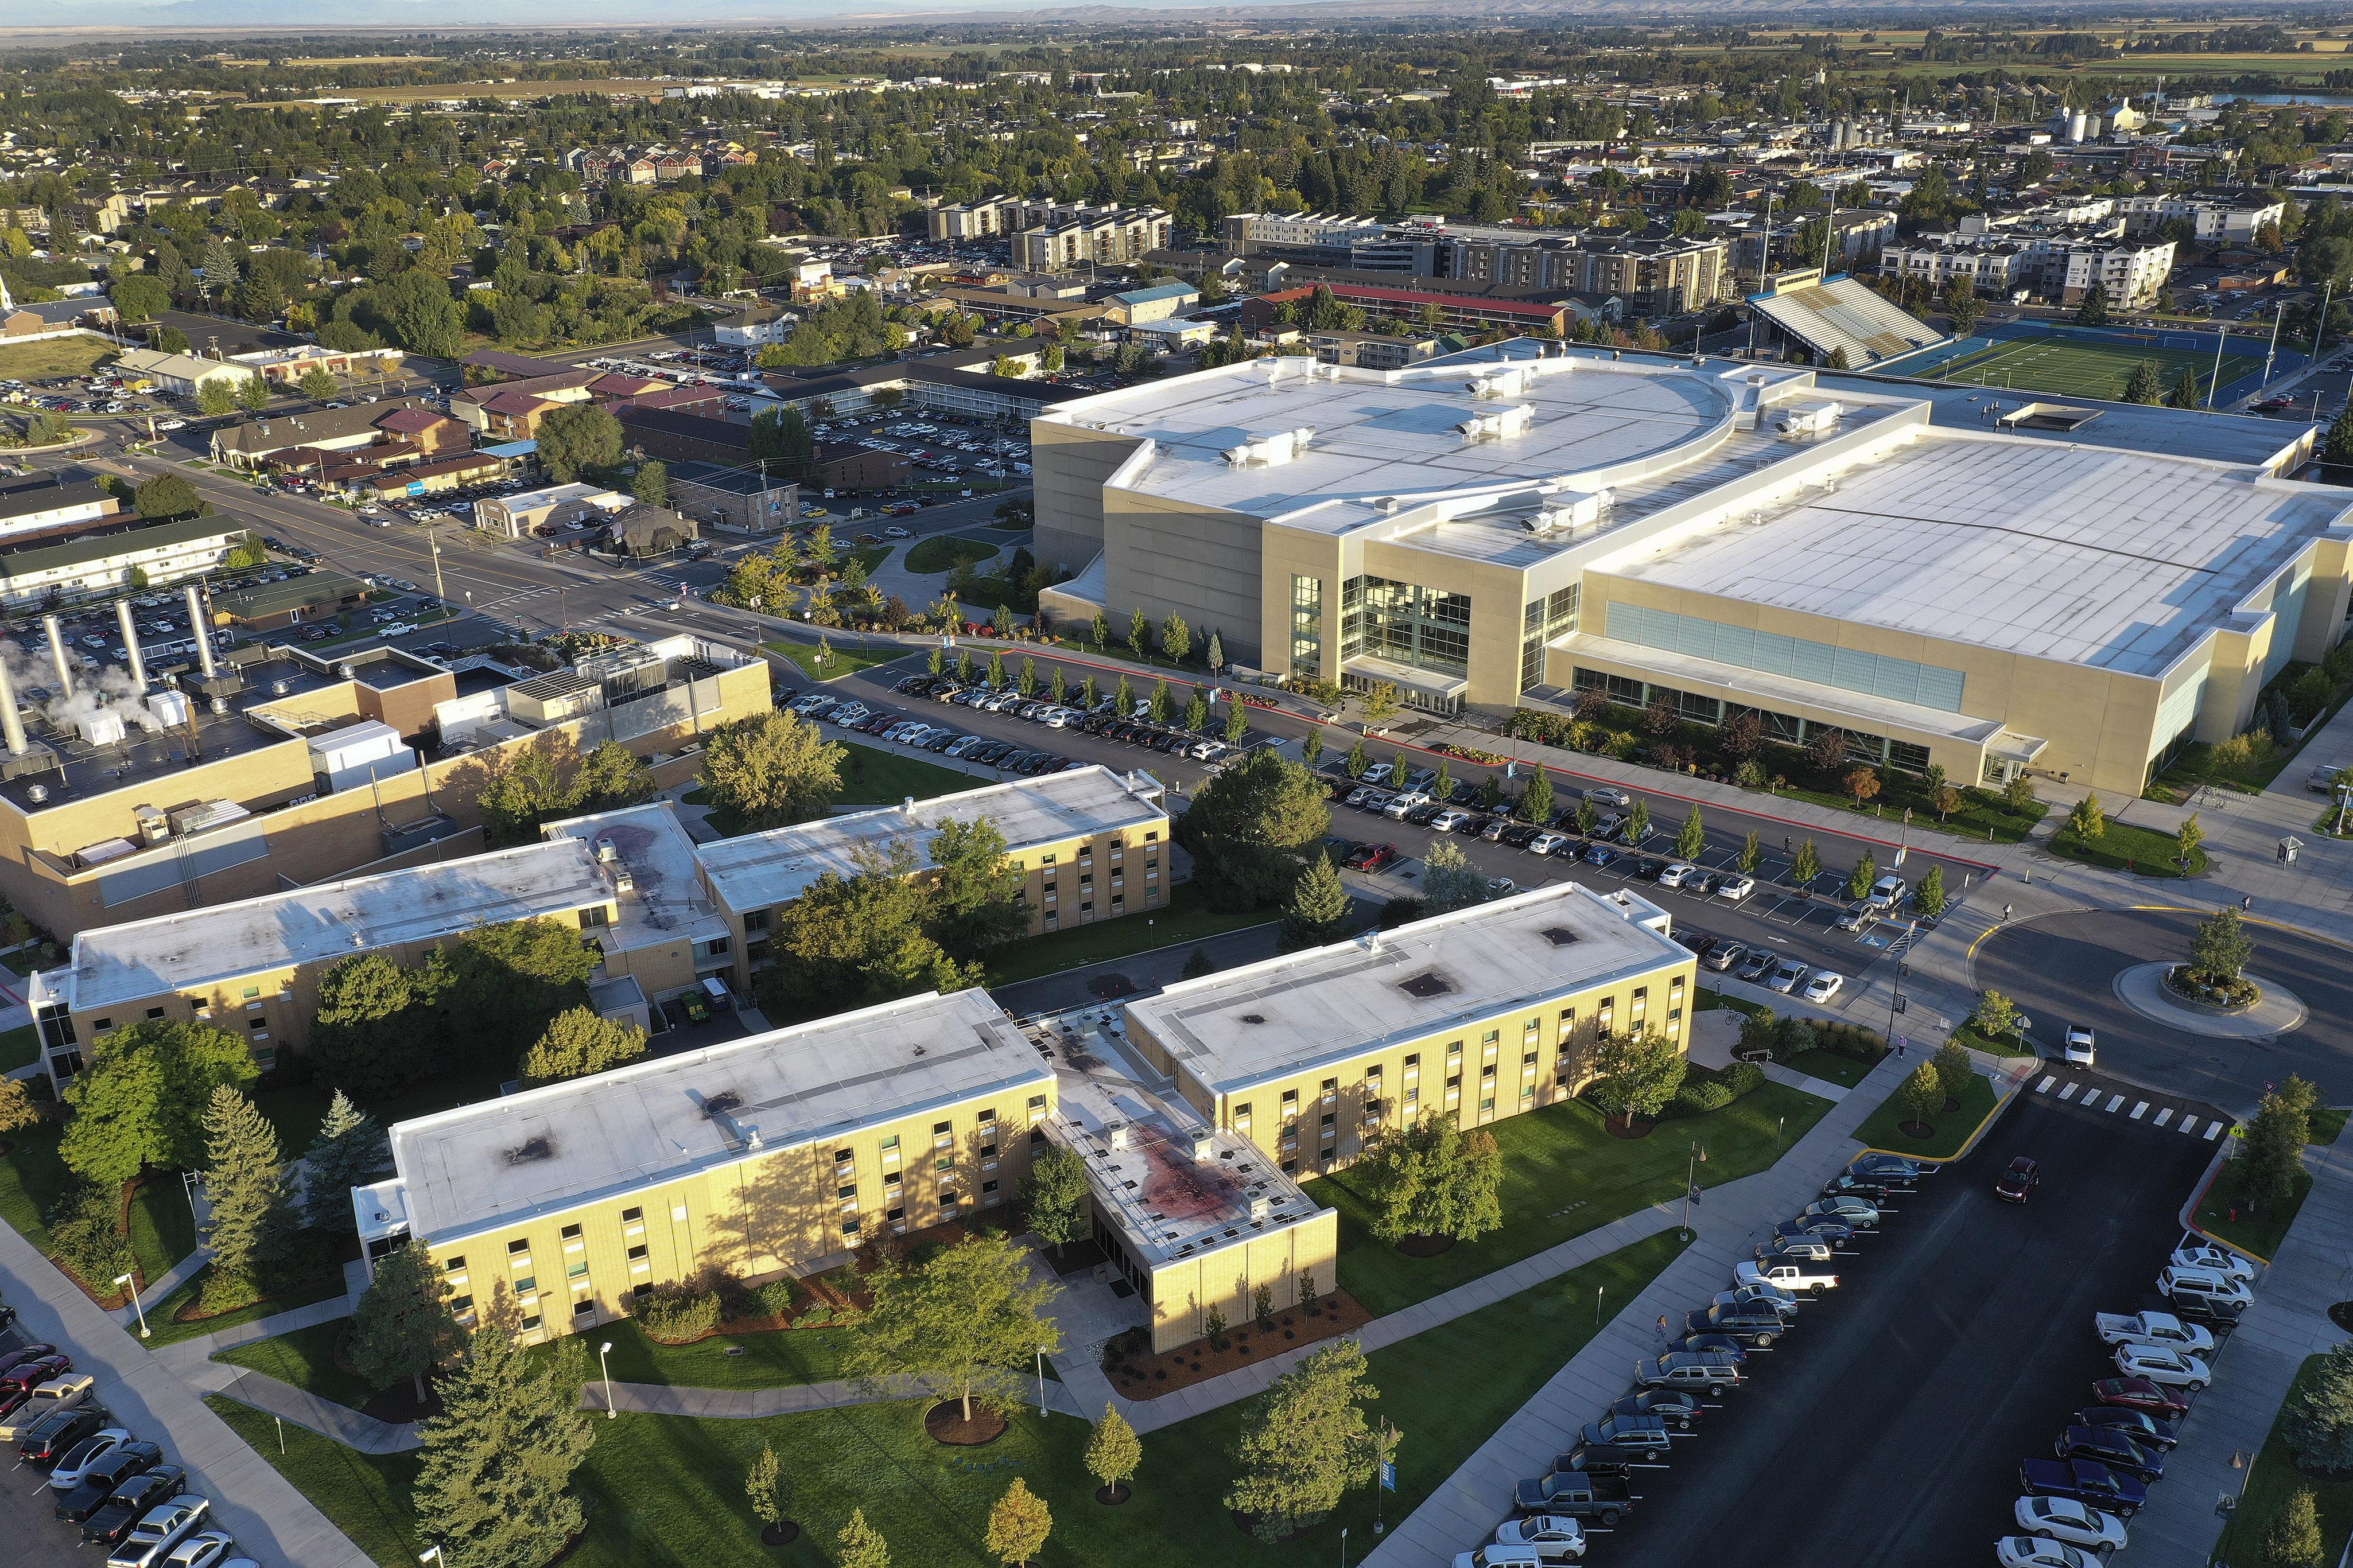 BYU Idaho campus in Rexburg on Monday, Sept. 23, 2019.